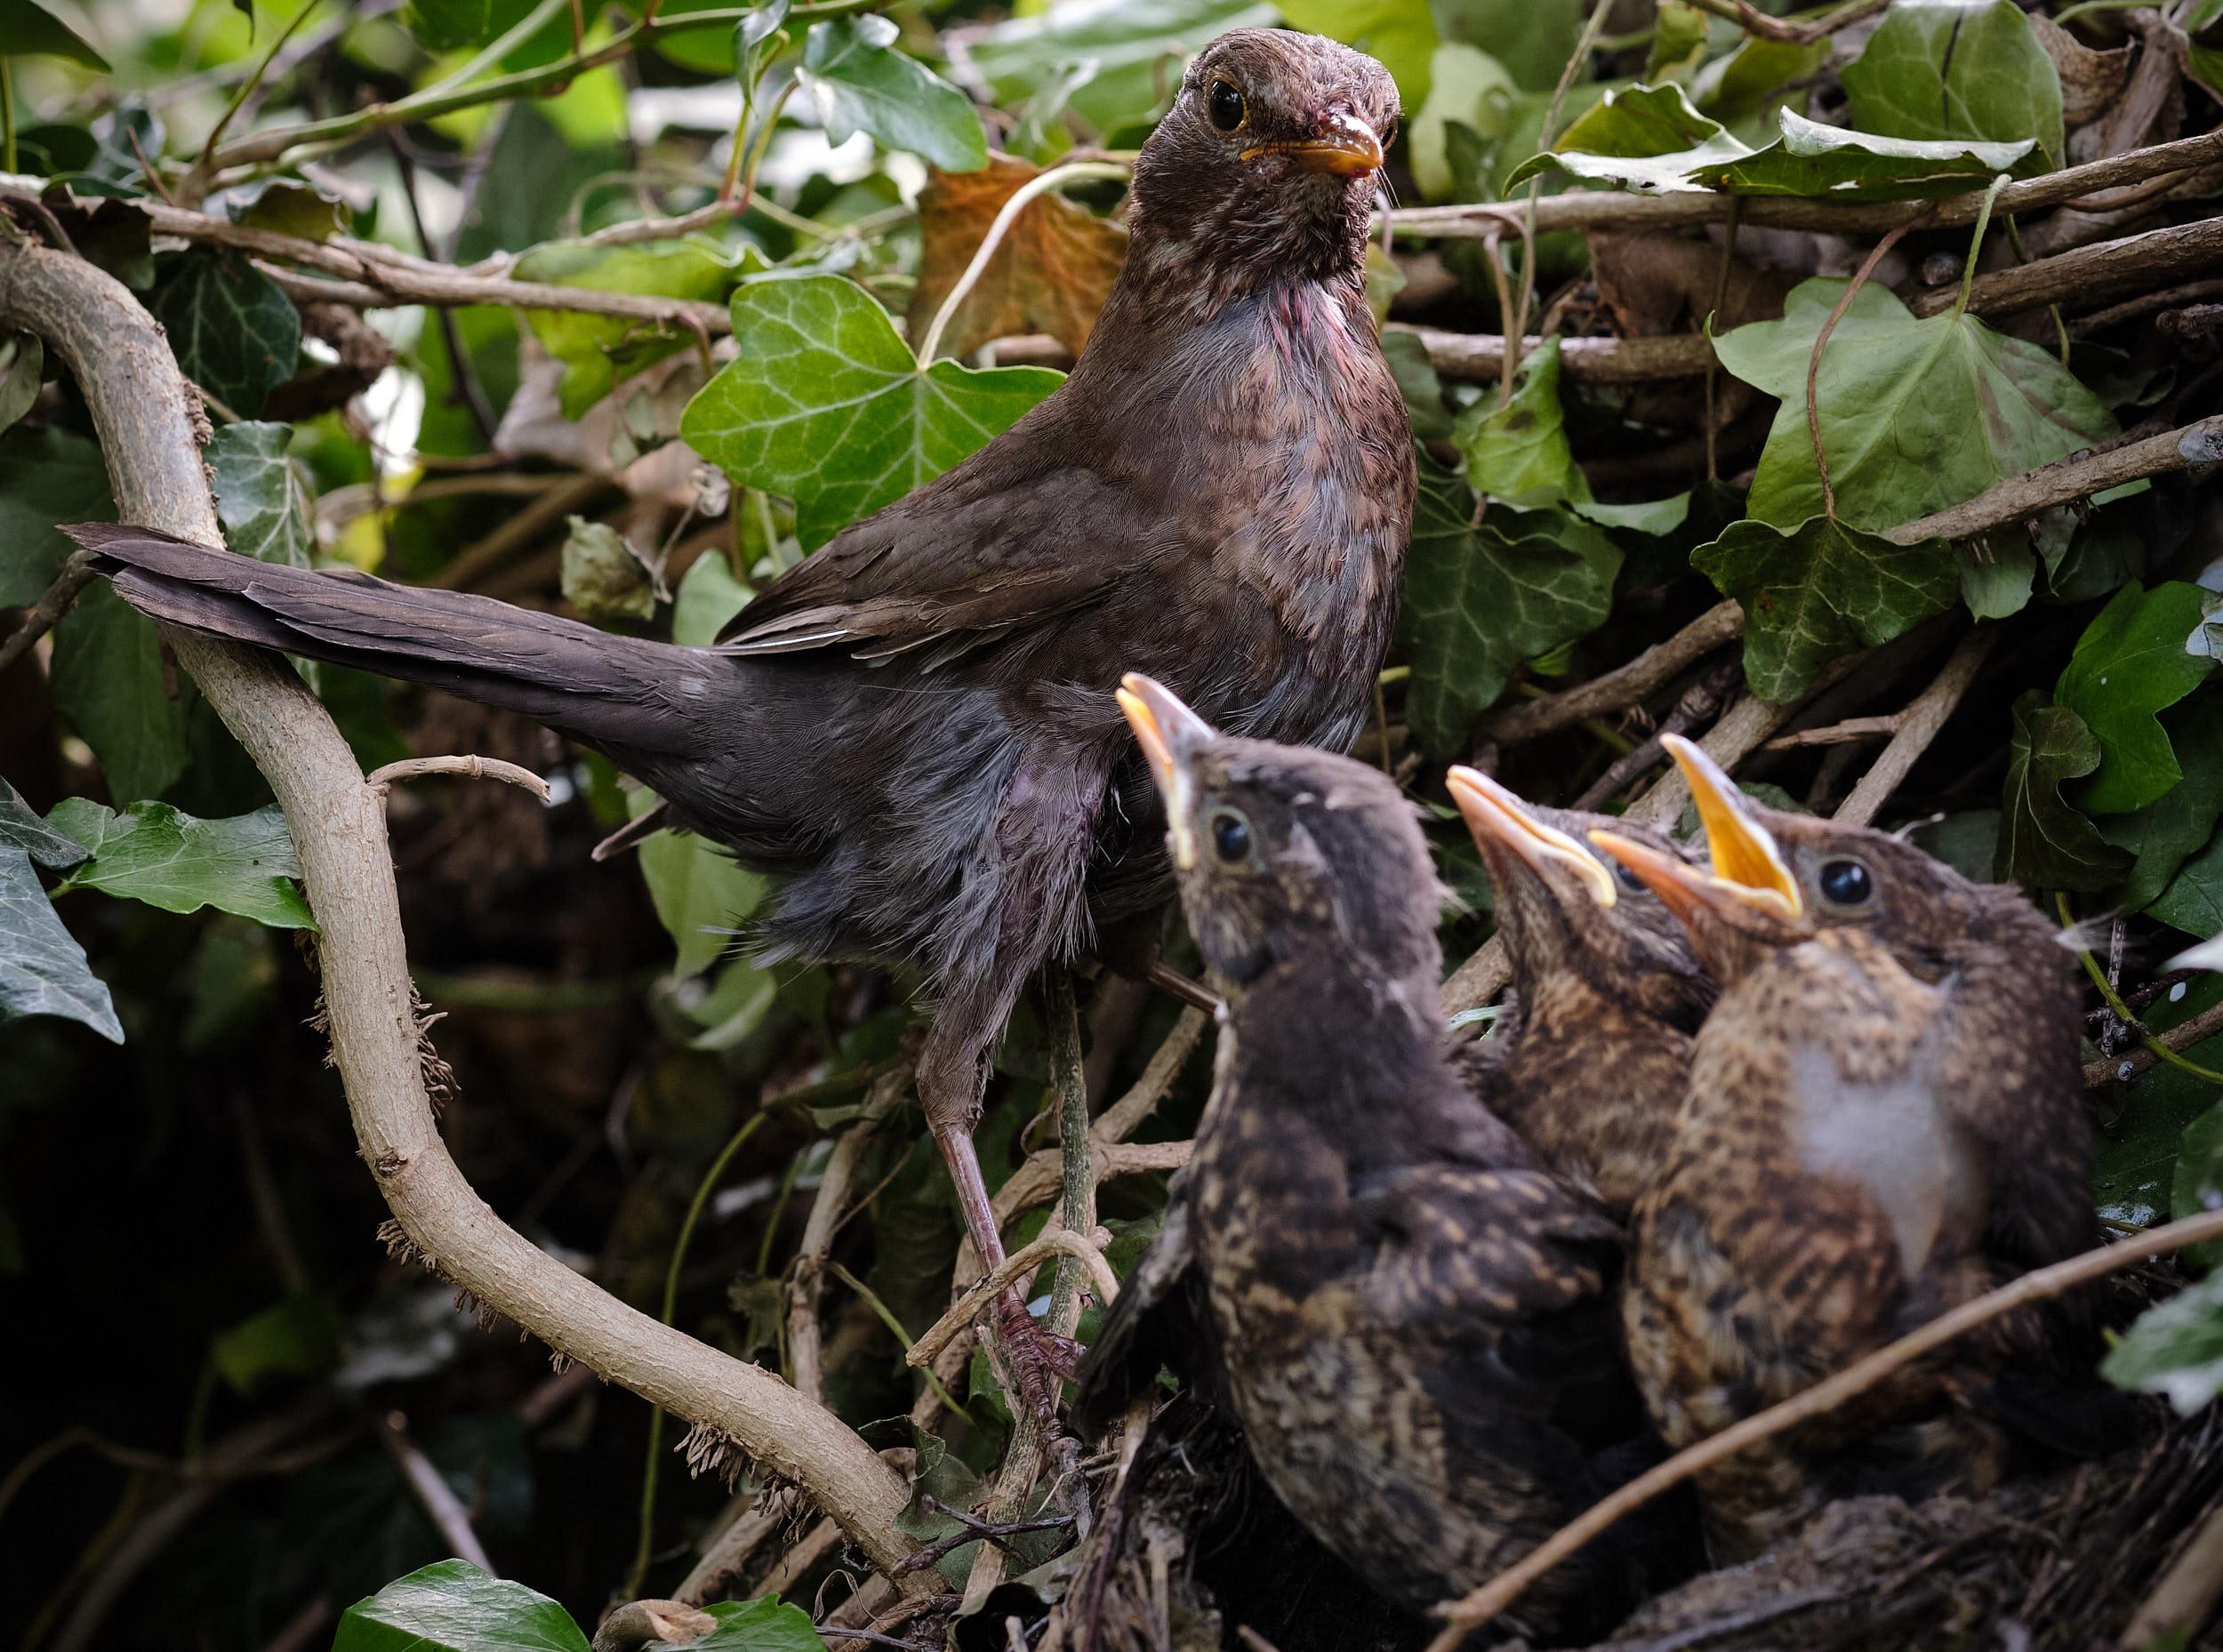 Amsel am Nest